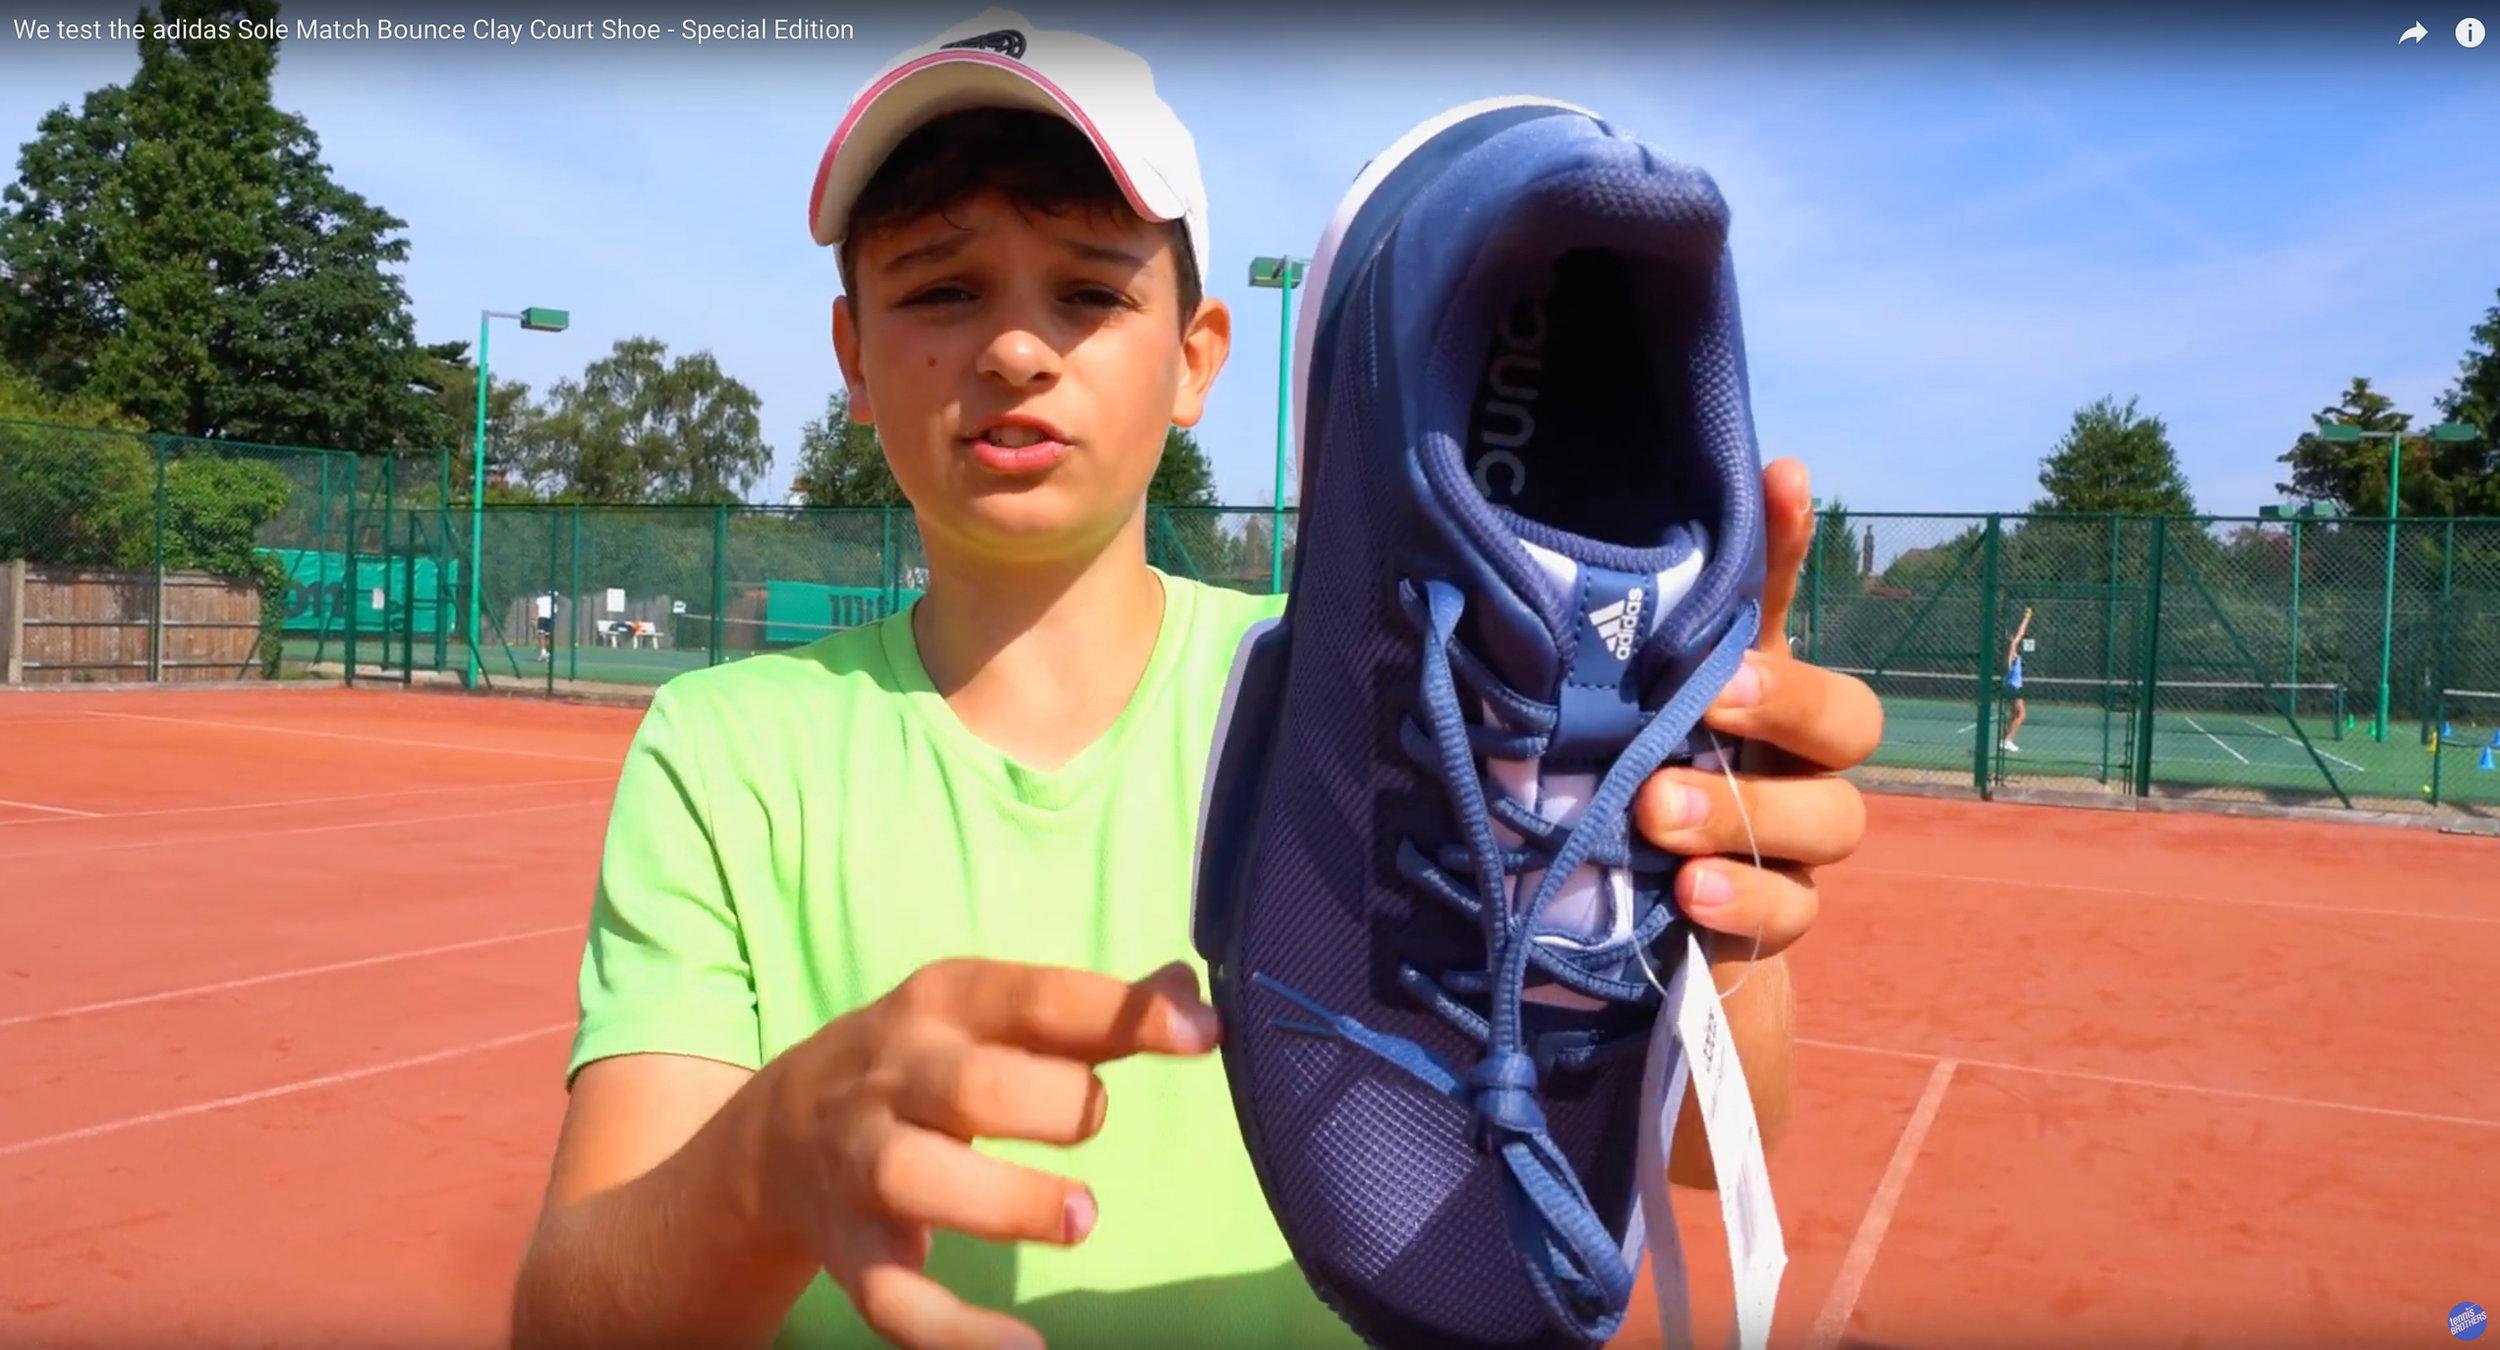 adidas Sole Match Bounce - Does Felix like the shoes too?